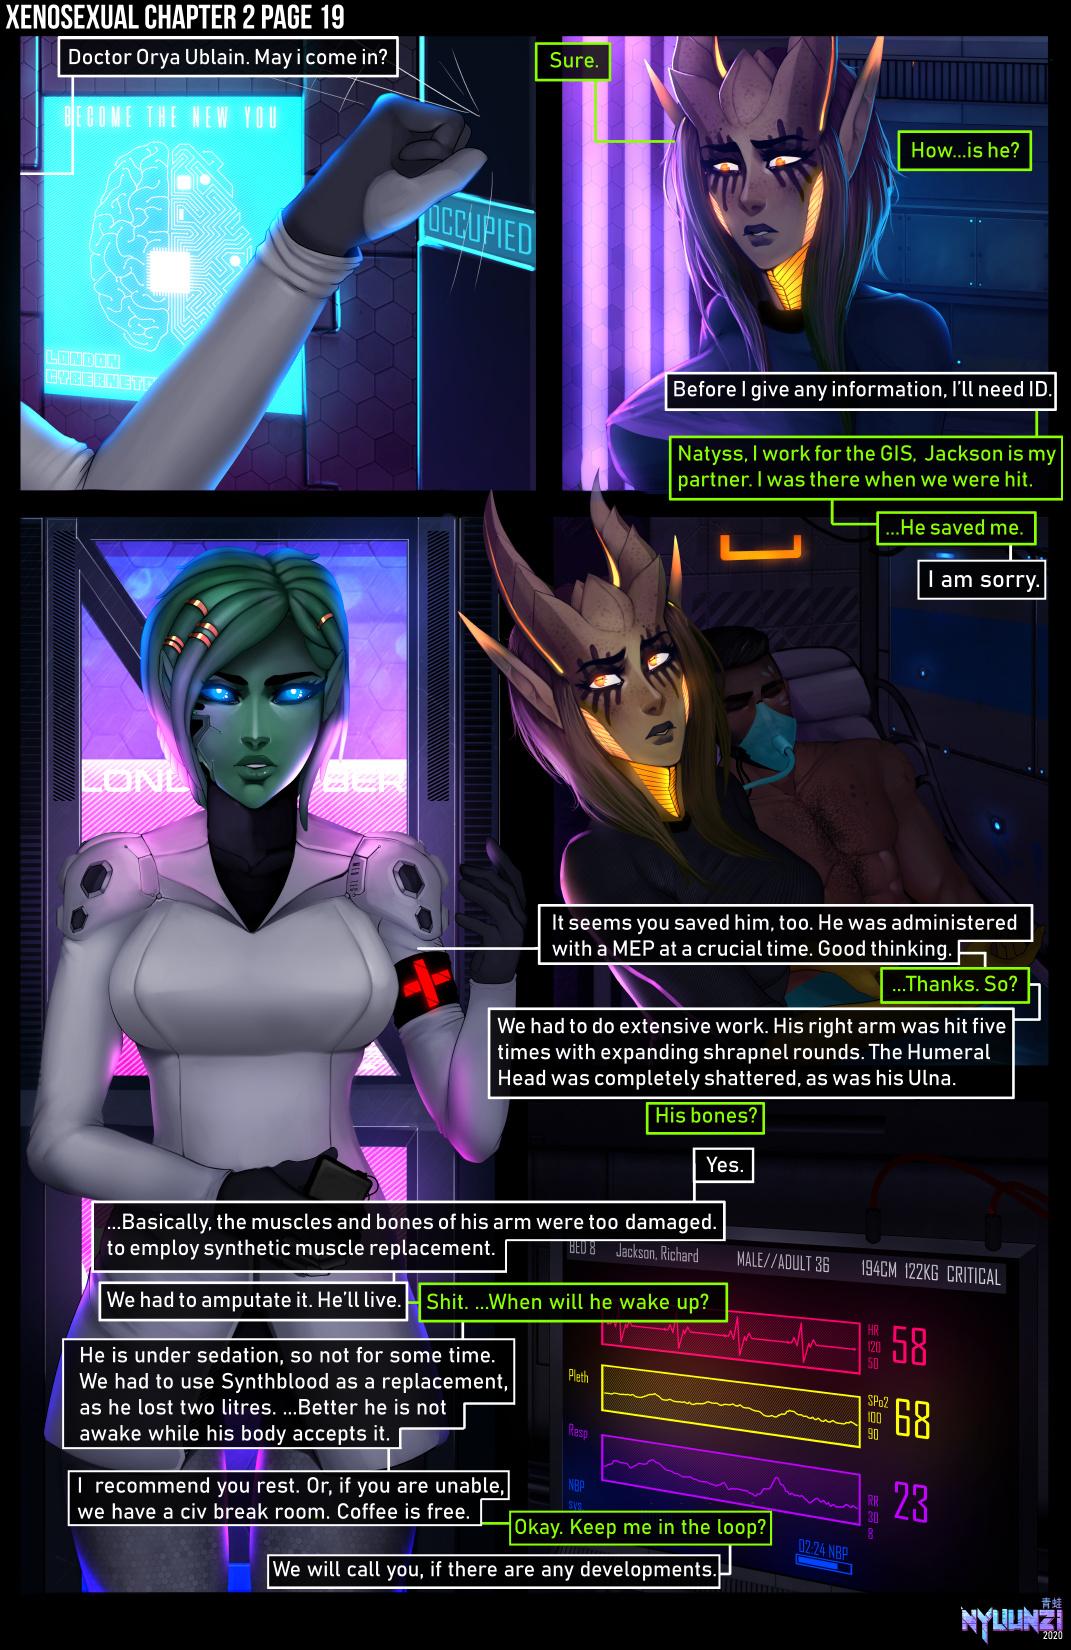 Xenosexual porn comics Oral sex, Aliens, Big Tits, Sci-Fi